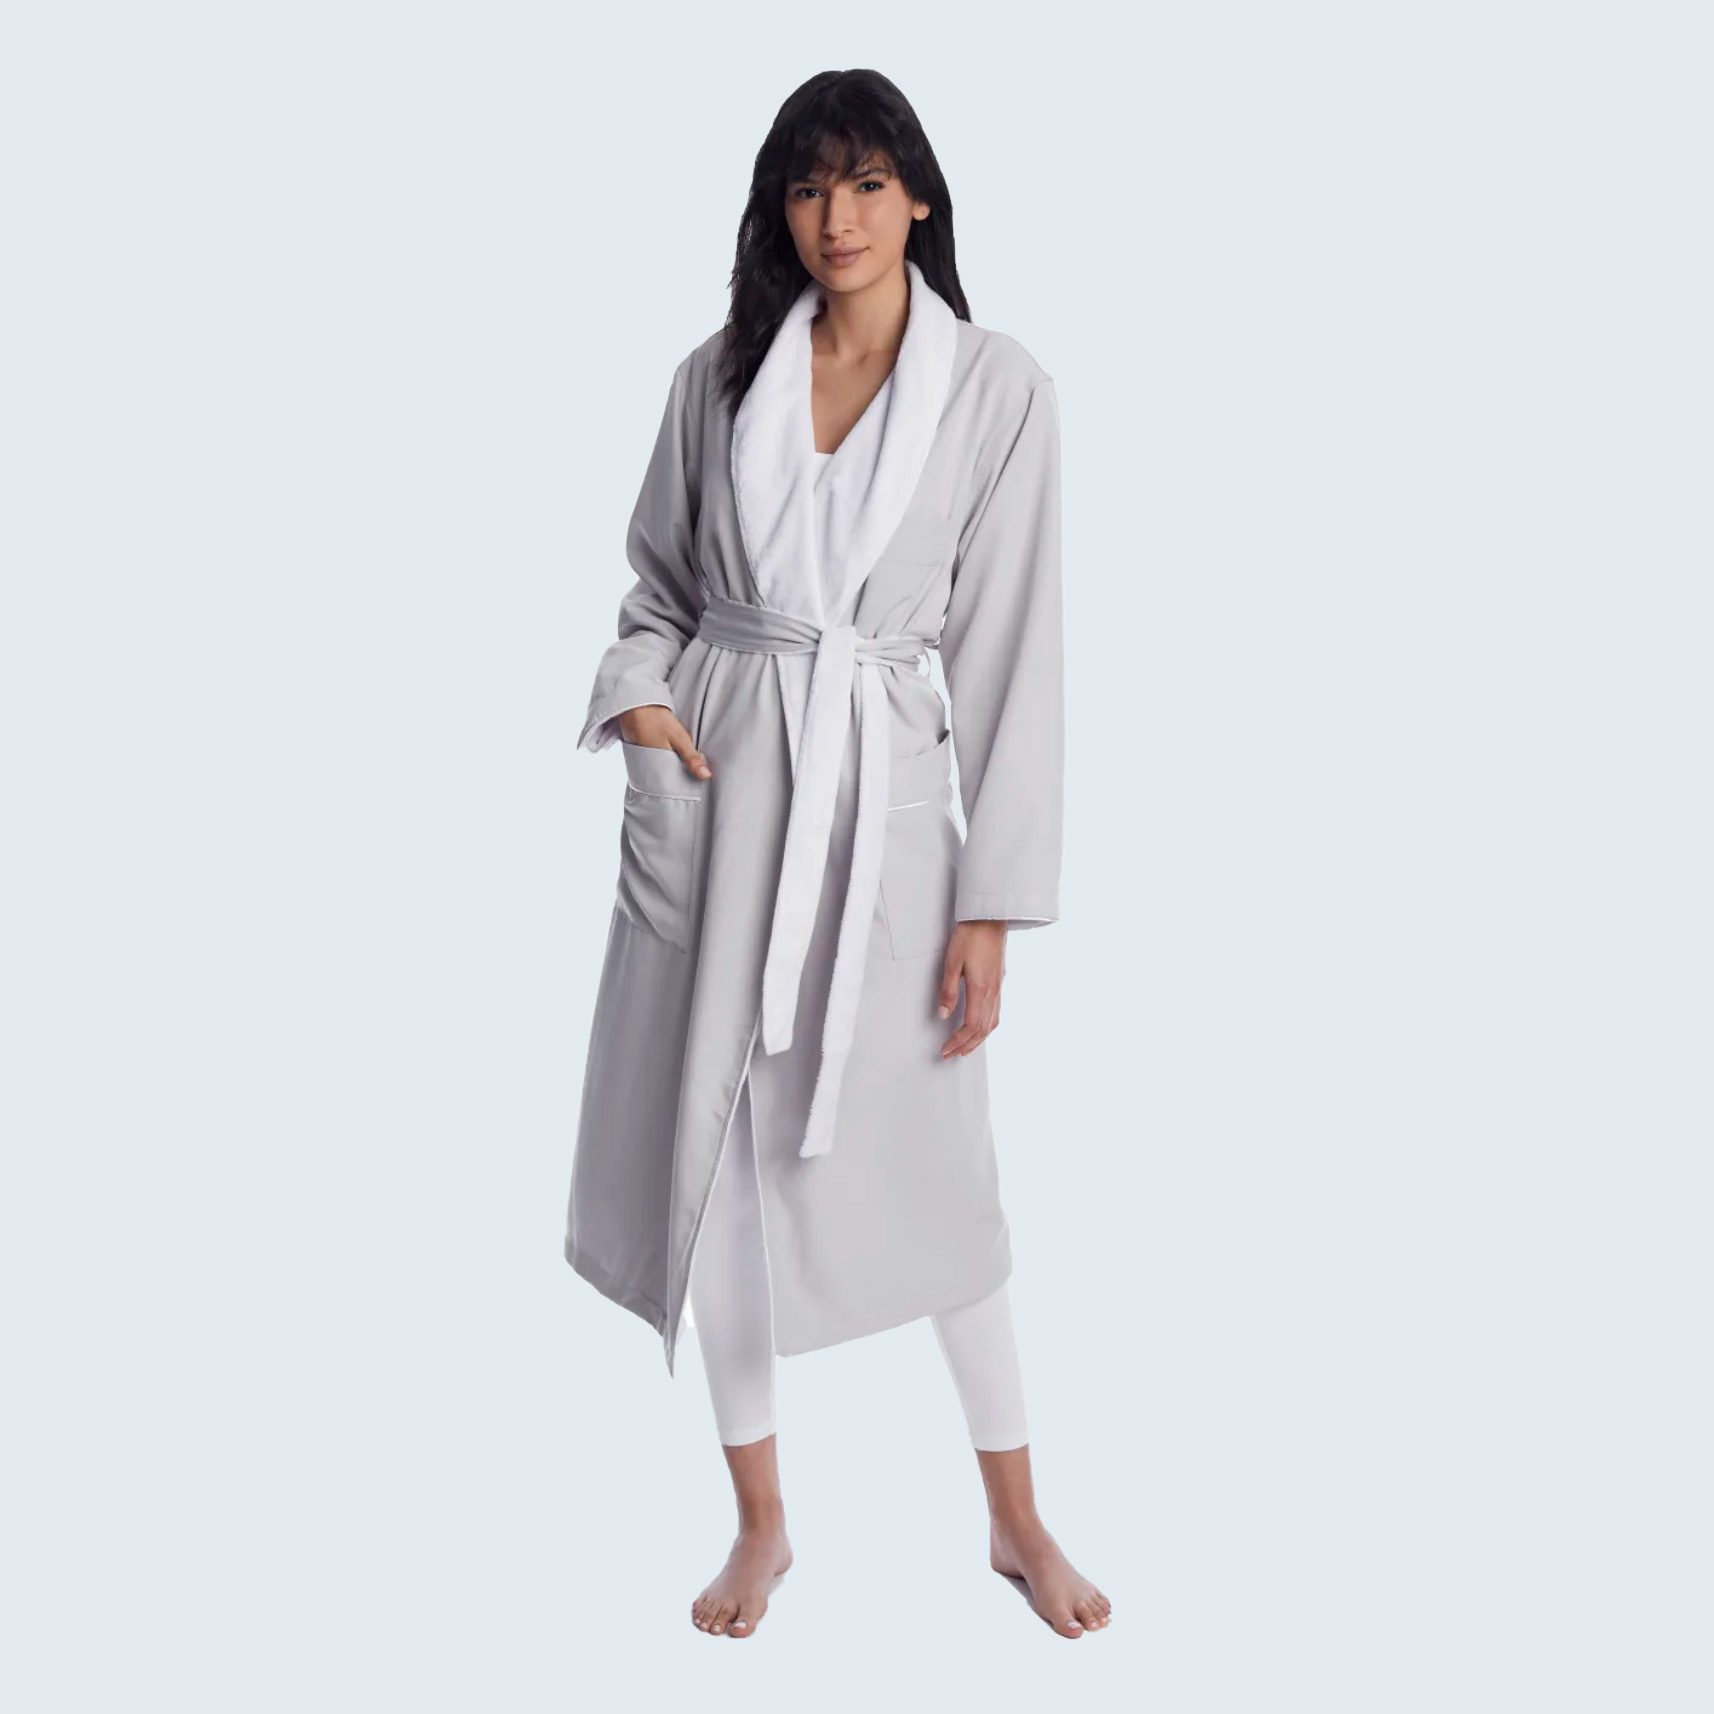 Arlotta Microfiber Plush-Lined Spa Robe from Bare Necessities